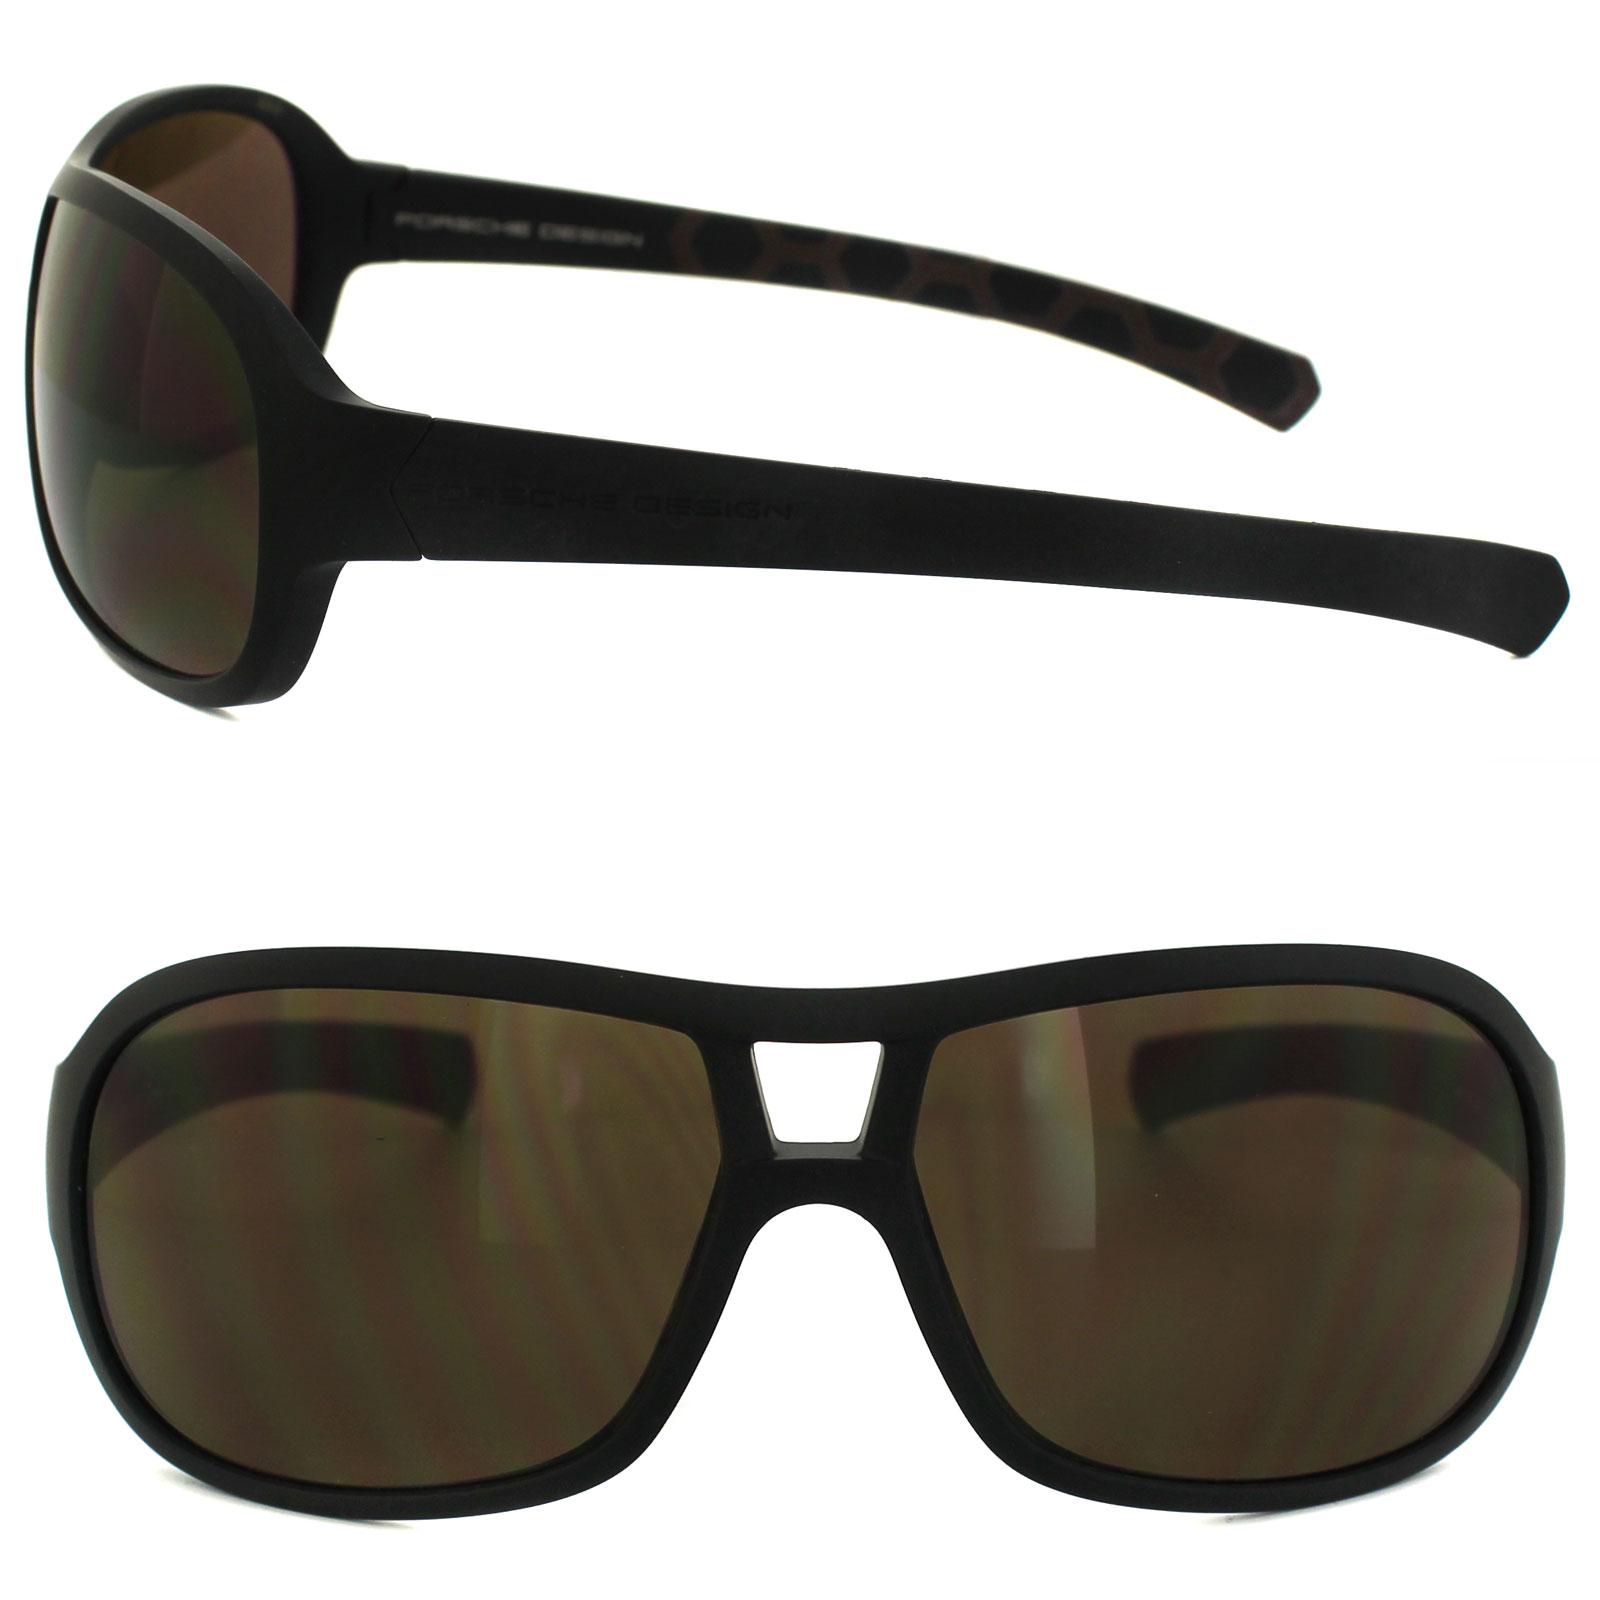 8a3c1a5c22f Porsche Design P8537 Sunglasses Thumbnail 1 Porsche Design P8537 Sunglasses  Thumbnail 2 ...